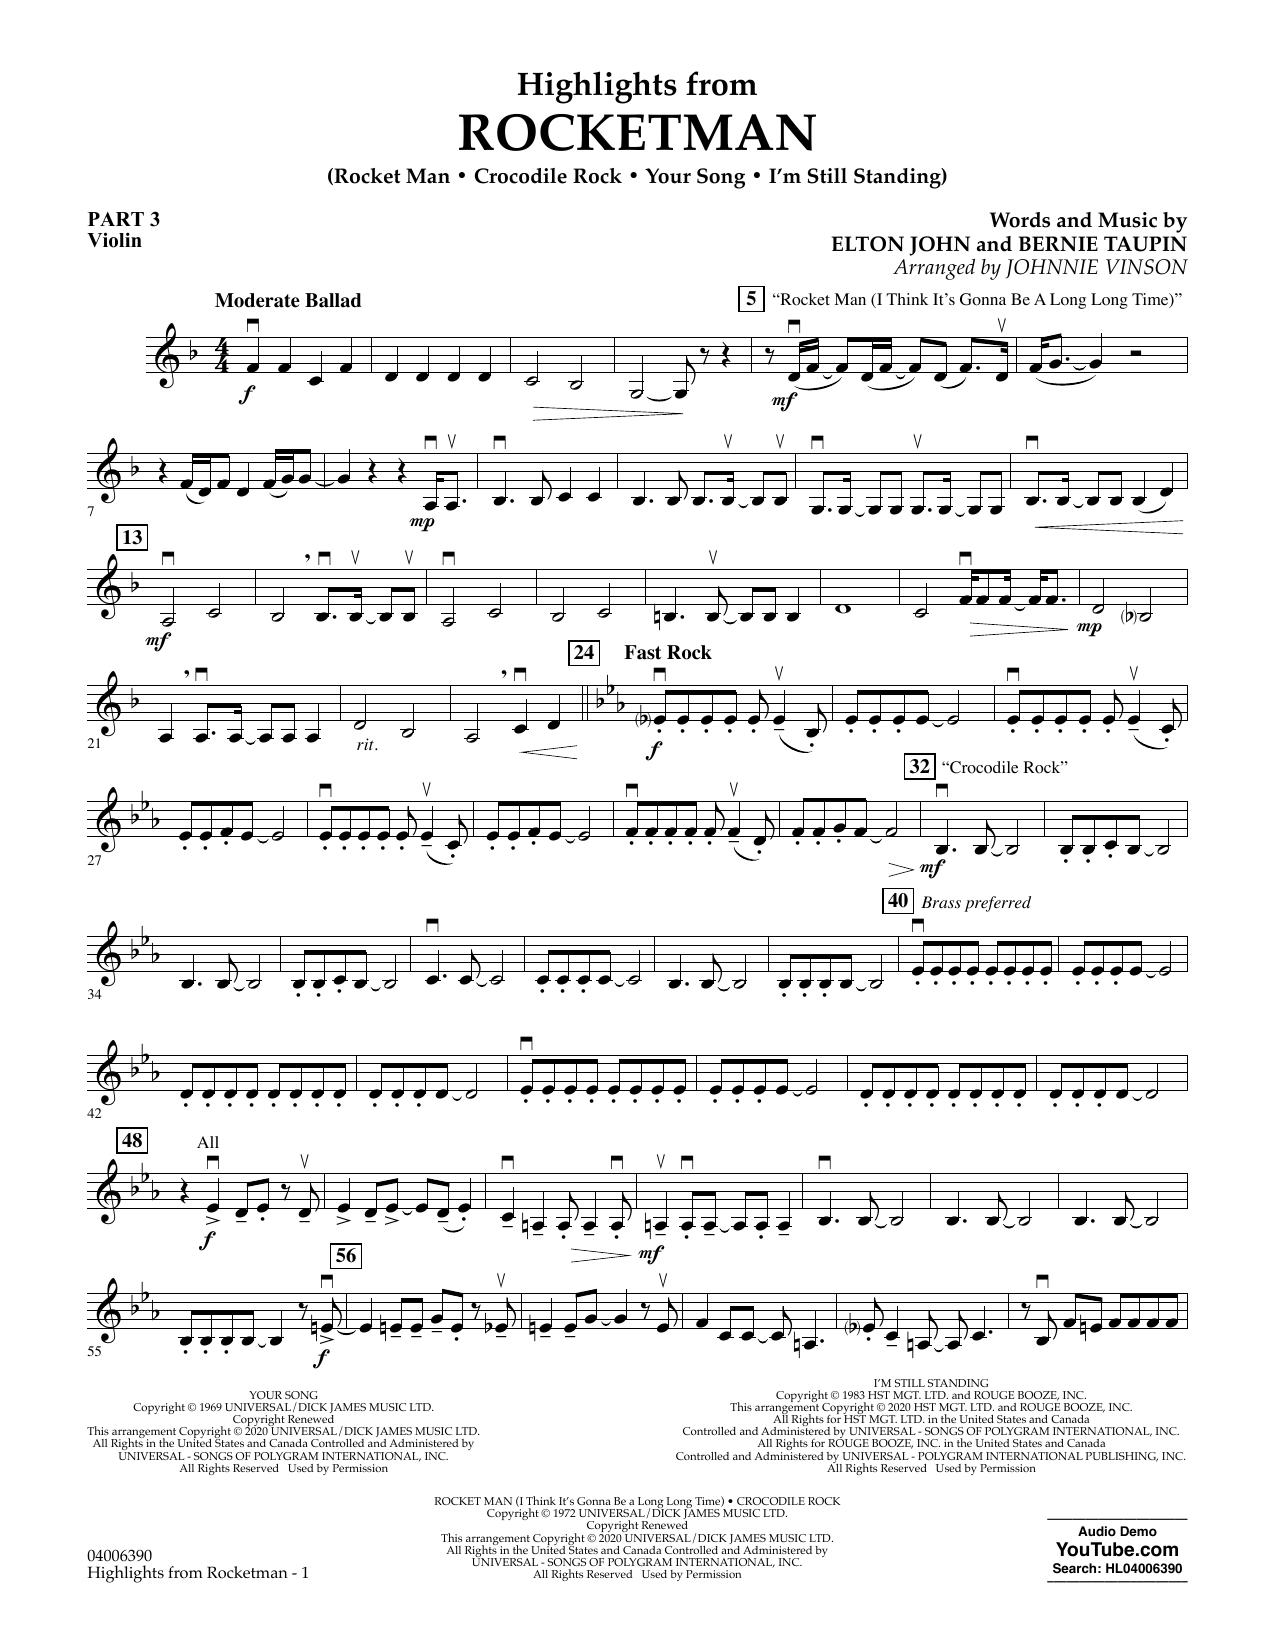 Highlights from Rocketman (arr. Johnnie Vinson) - Pt.3 - Violin (Flex-Band)